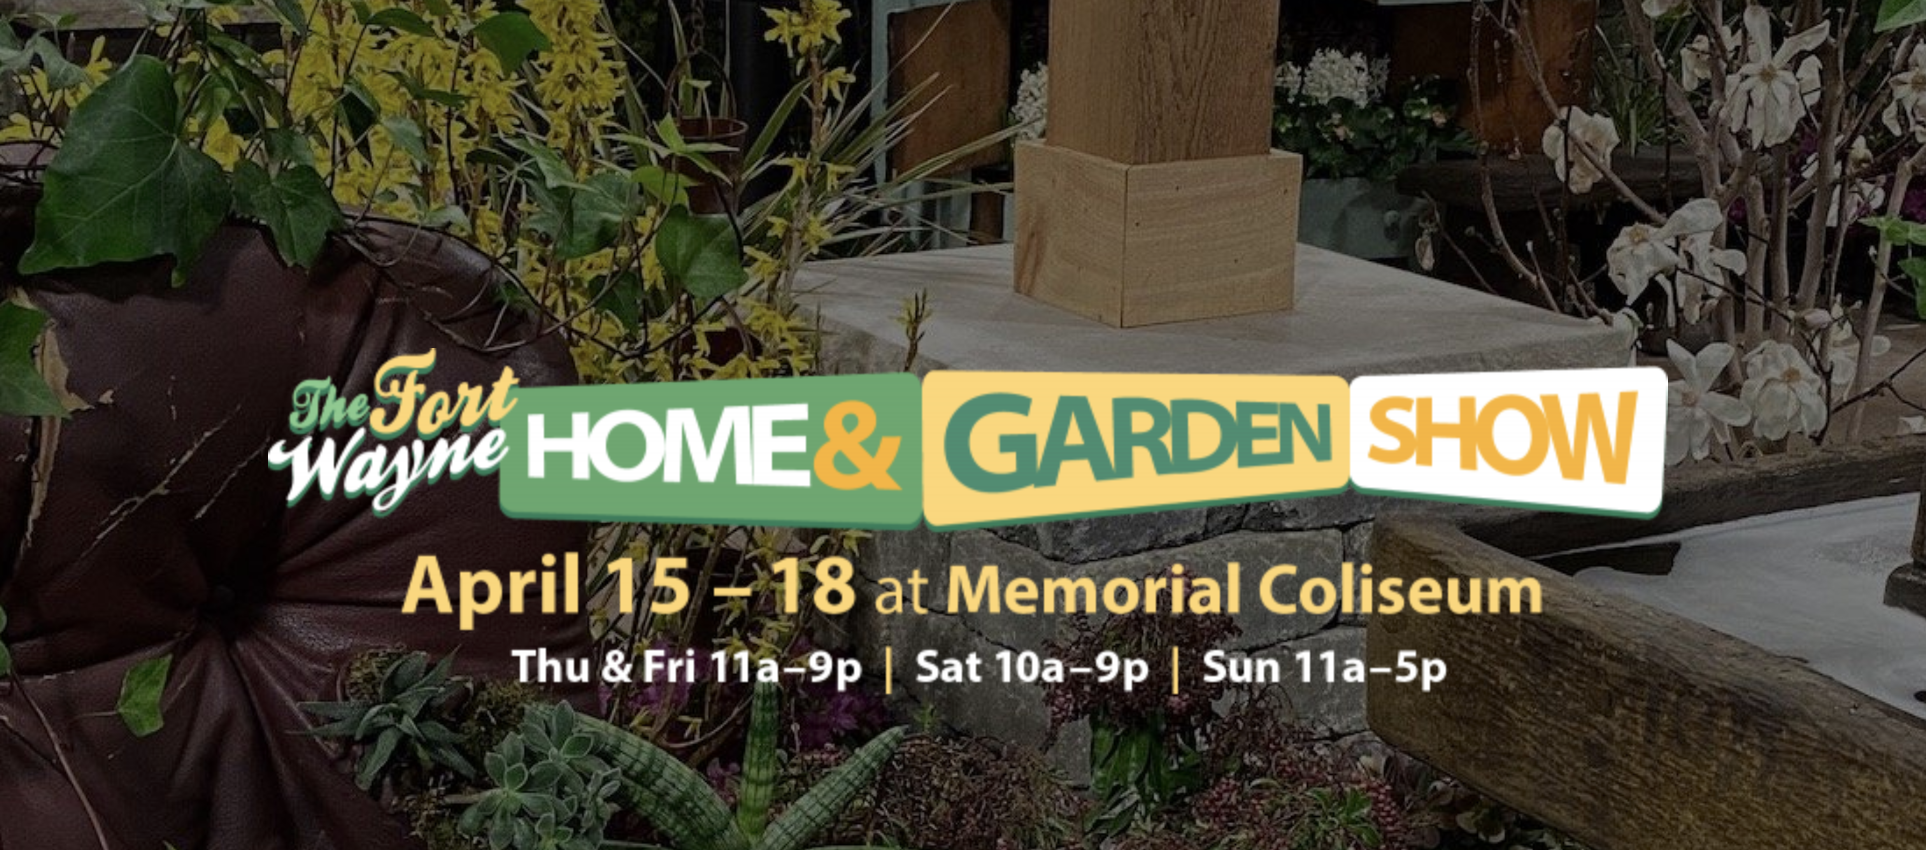 Fort Wayne Home and Garden Show logo.